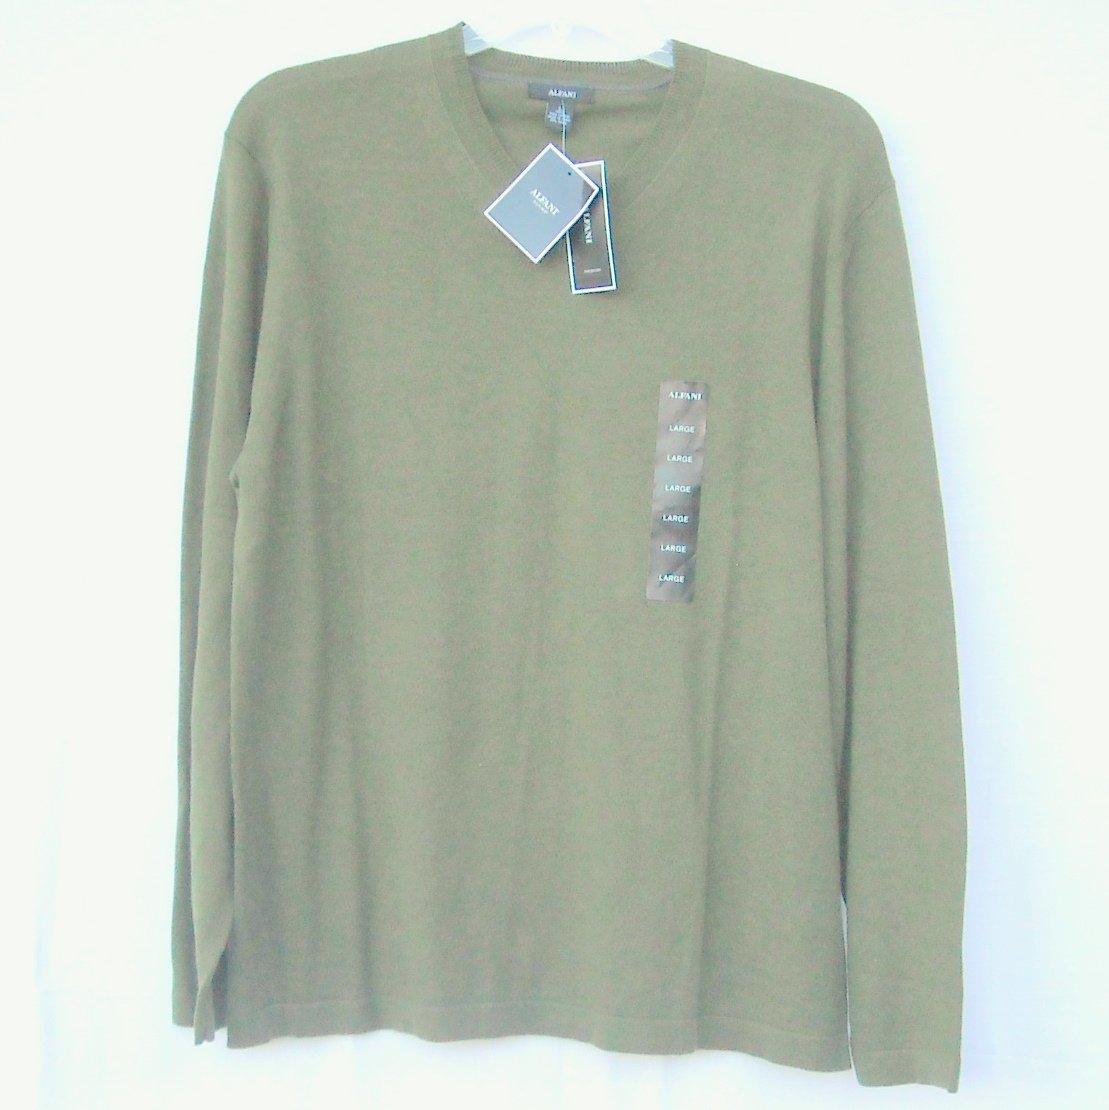 Alfani Fir Htr V Neck Pima Cotton Boys Long Sleeve Knit Shirt Sweater size L